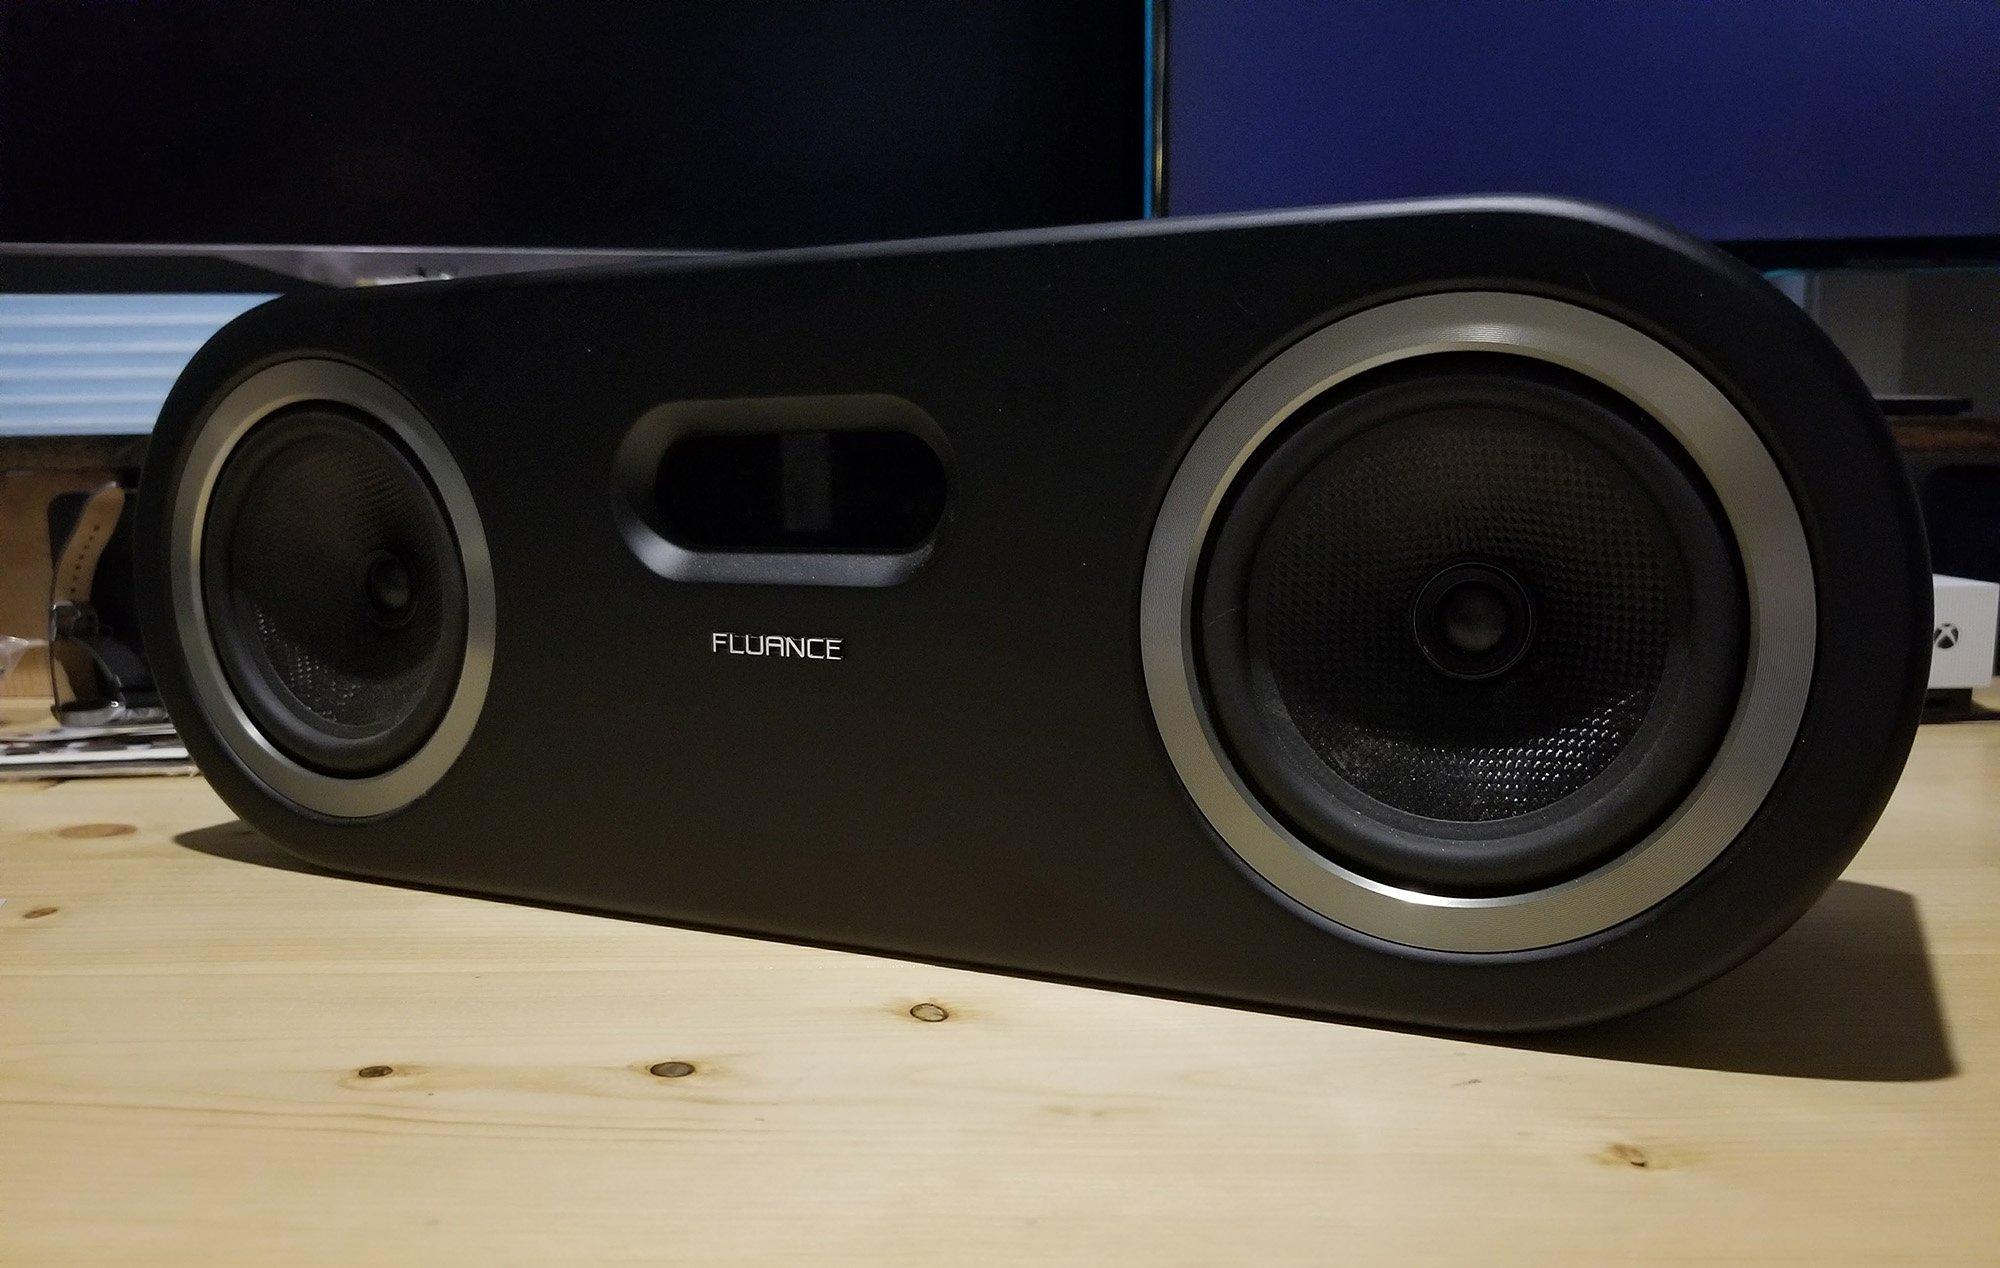 Fluance Fi50 speaker review, the best bluetooth speaker under $200?